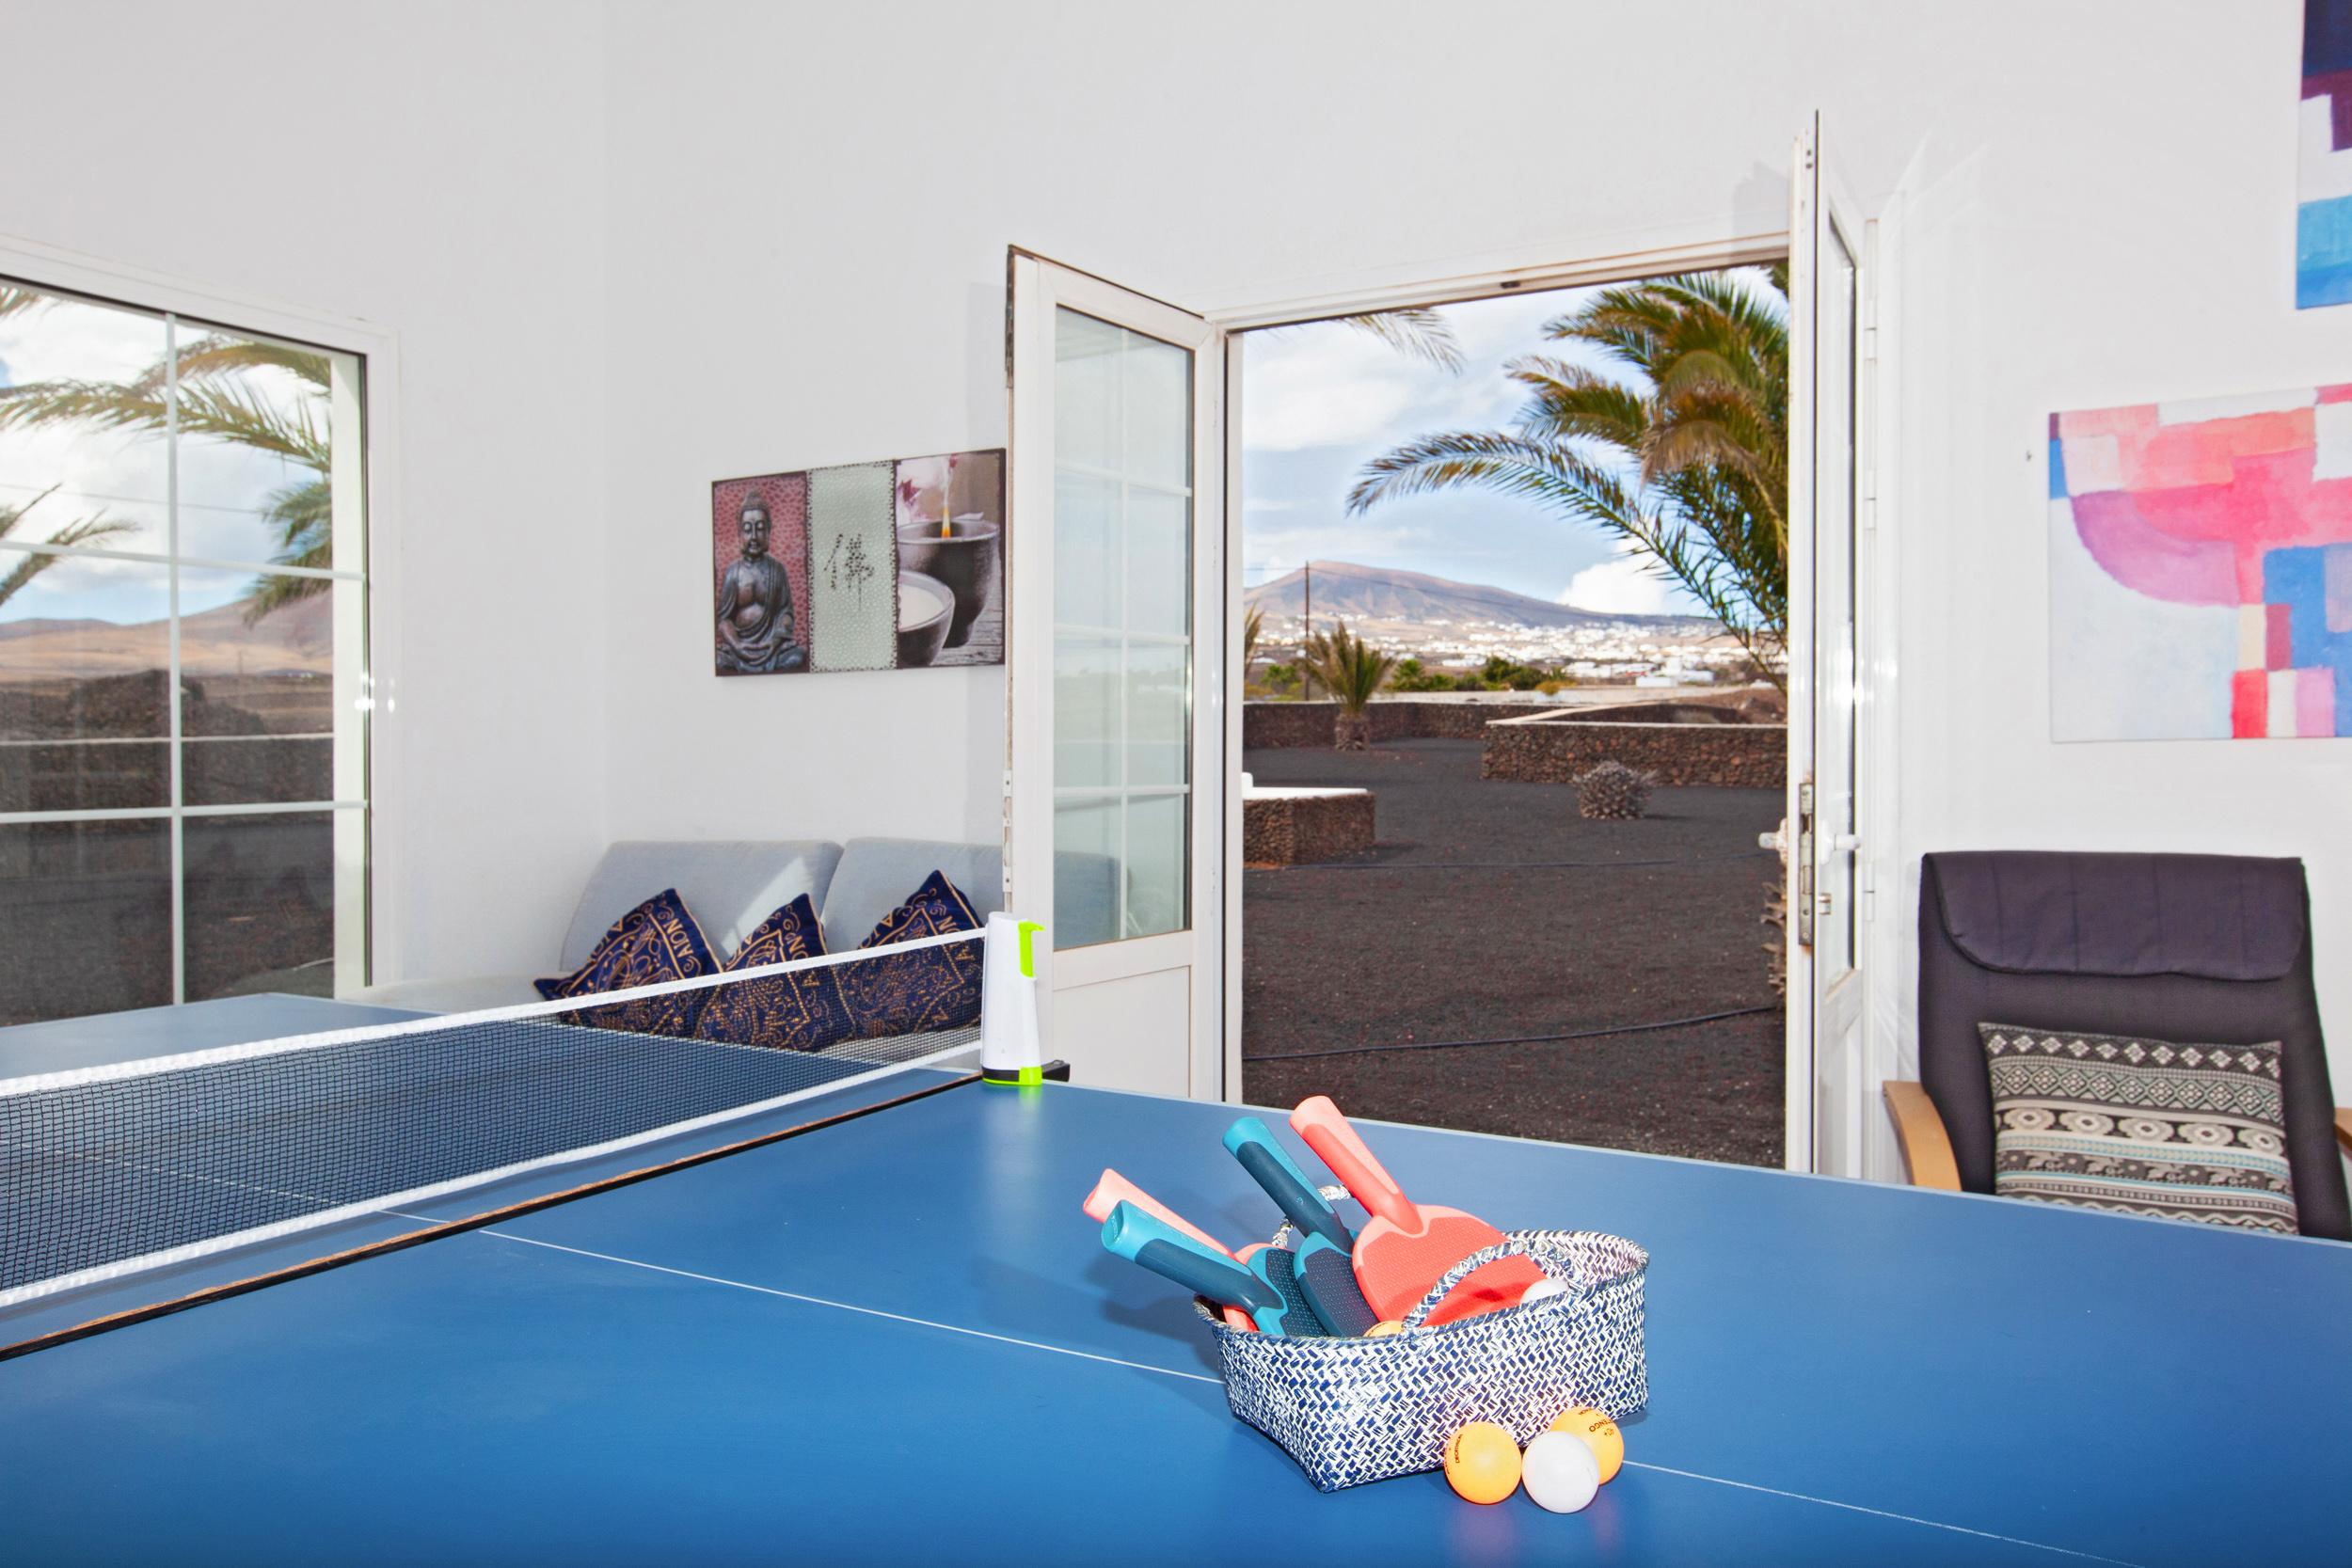 LVC198416 Table tennis